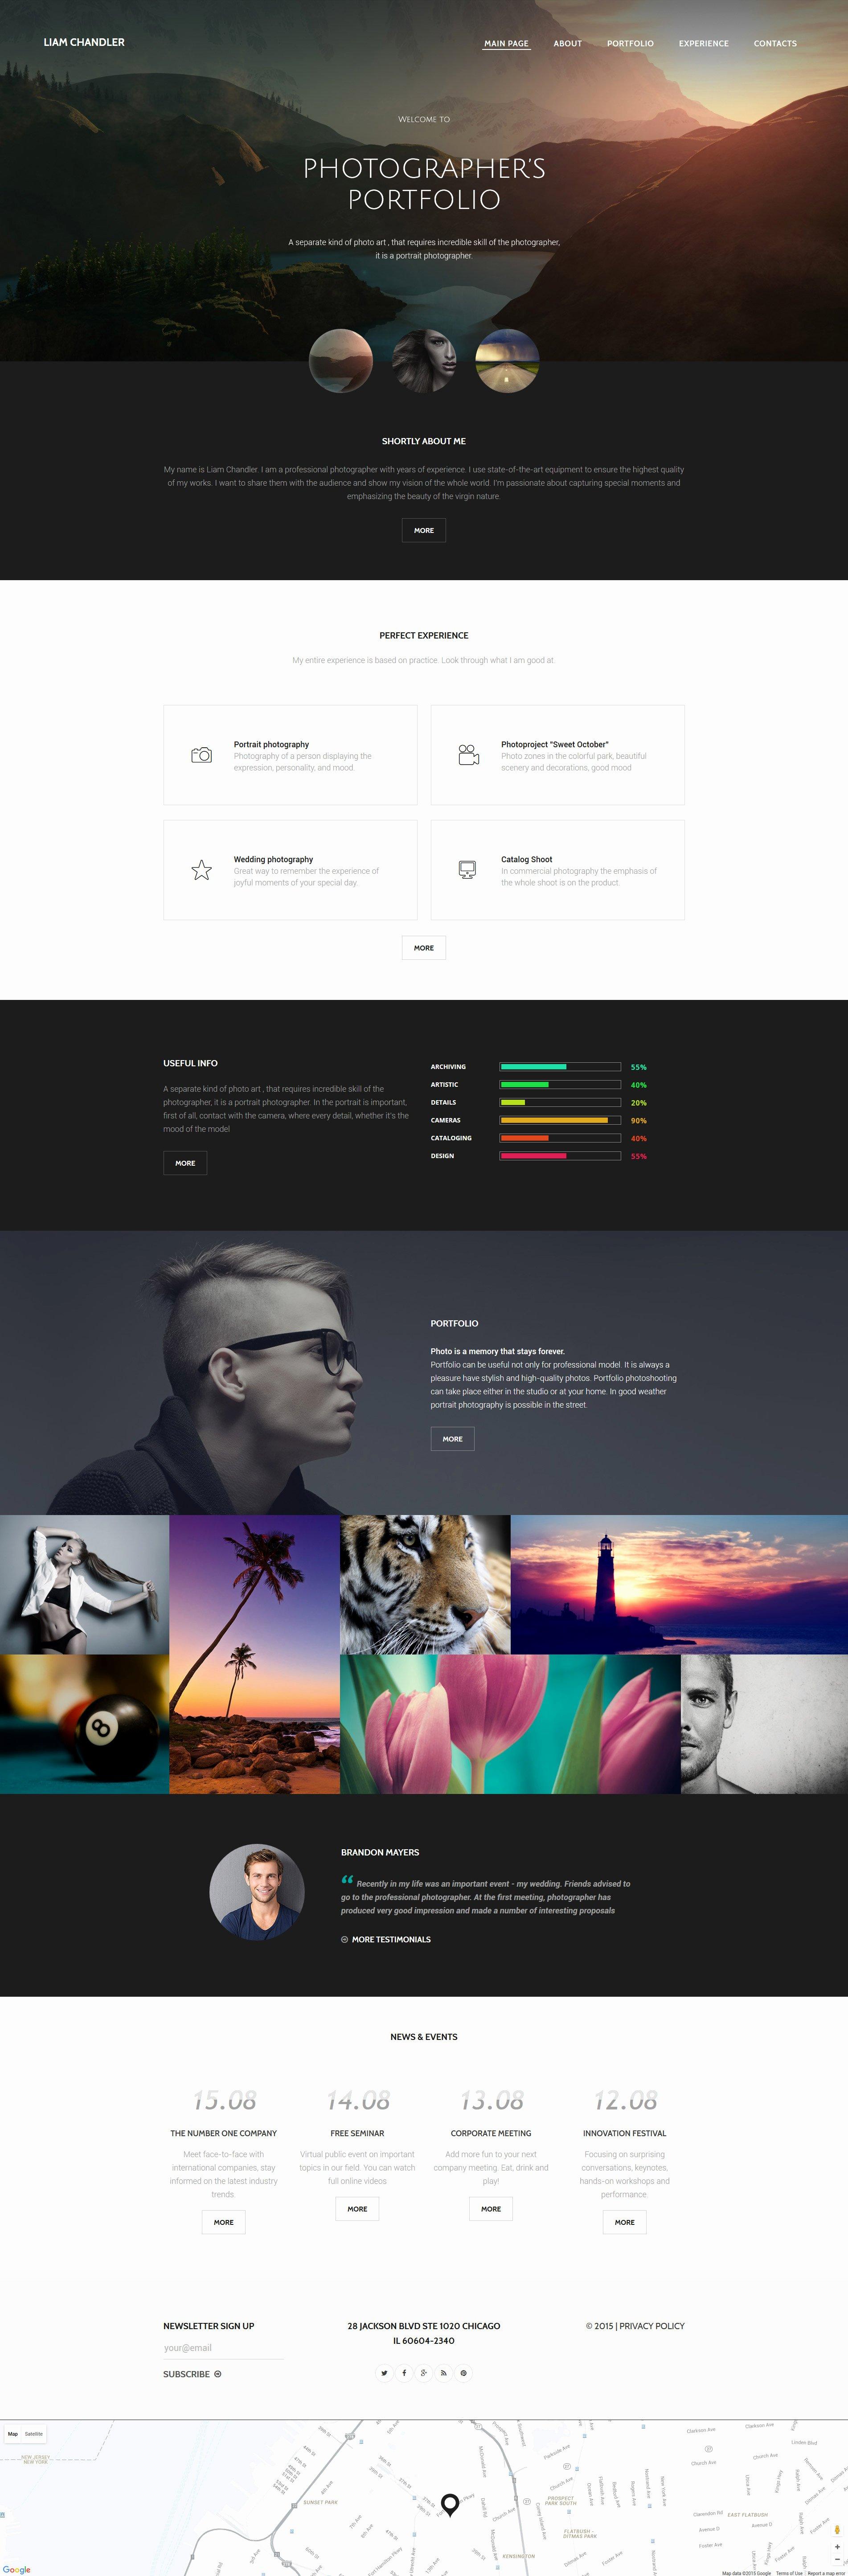 Grapher Portfolio Website Template